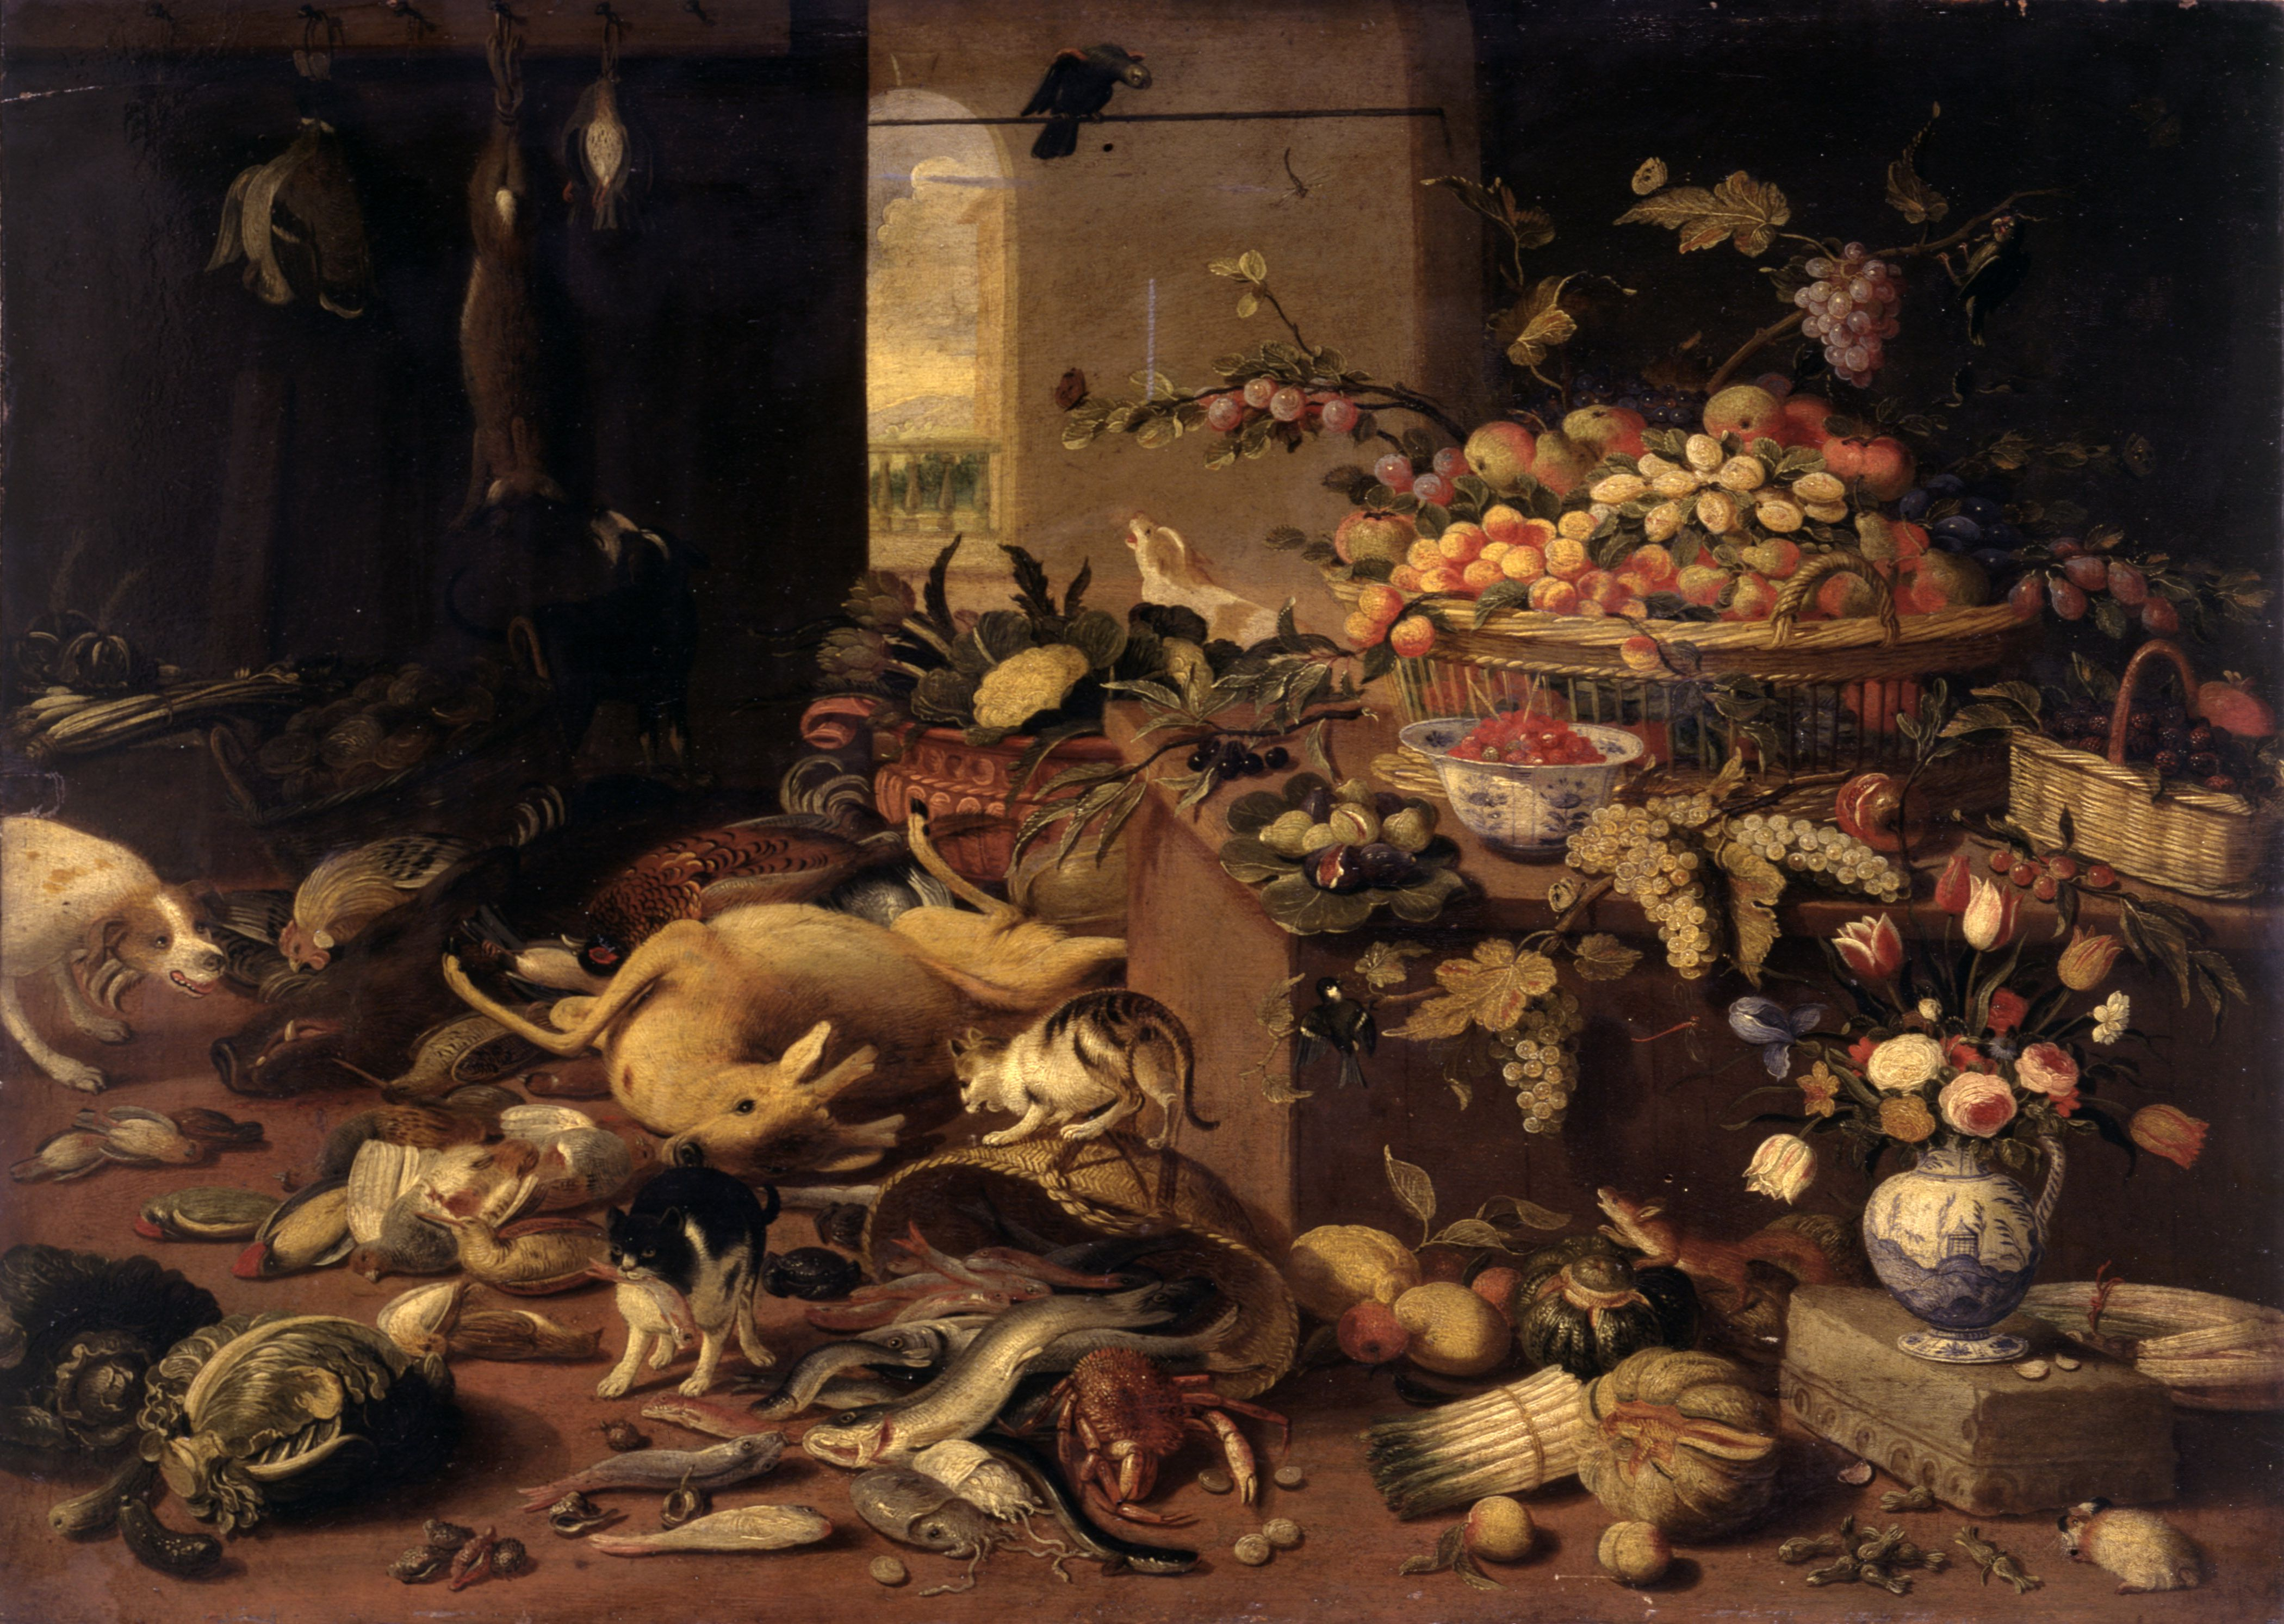 Still Life, after Jan van Kessel, 17th Century, oil on board, 37 x 52 cm